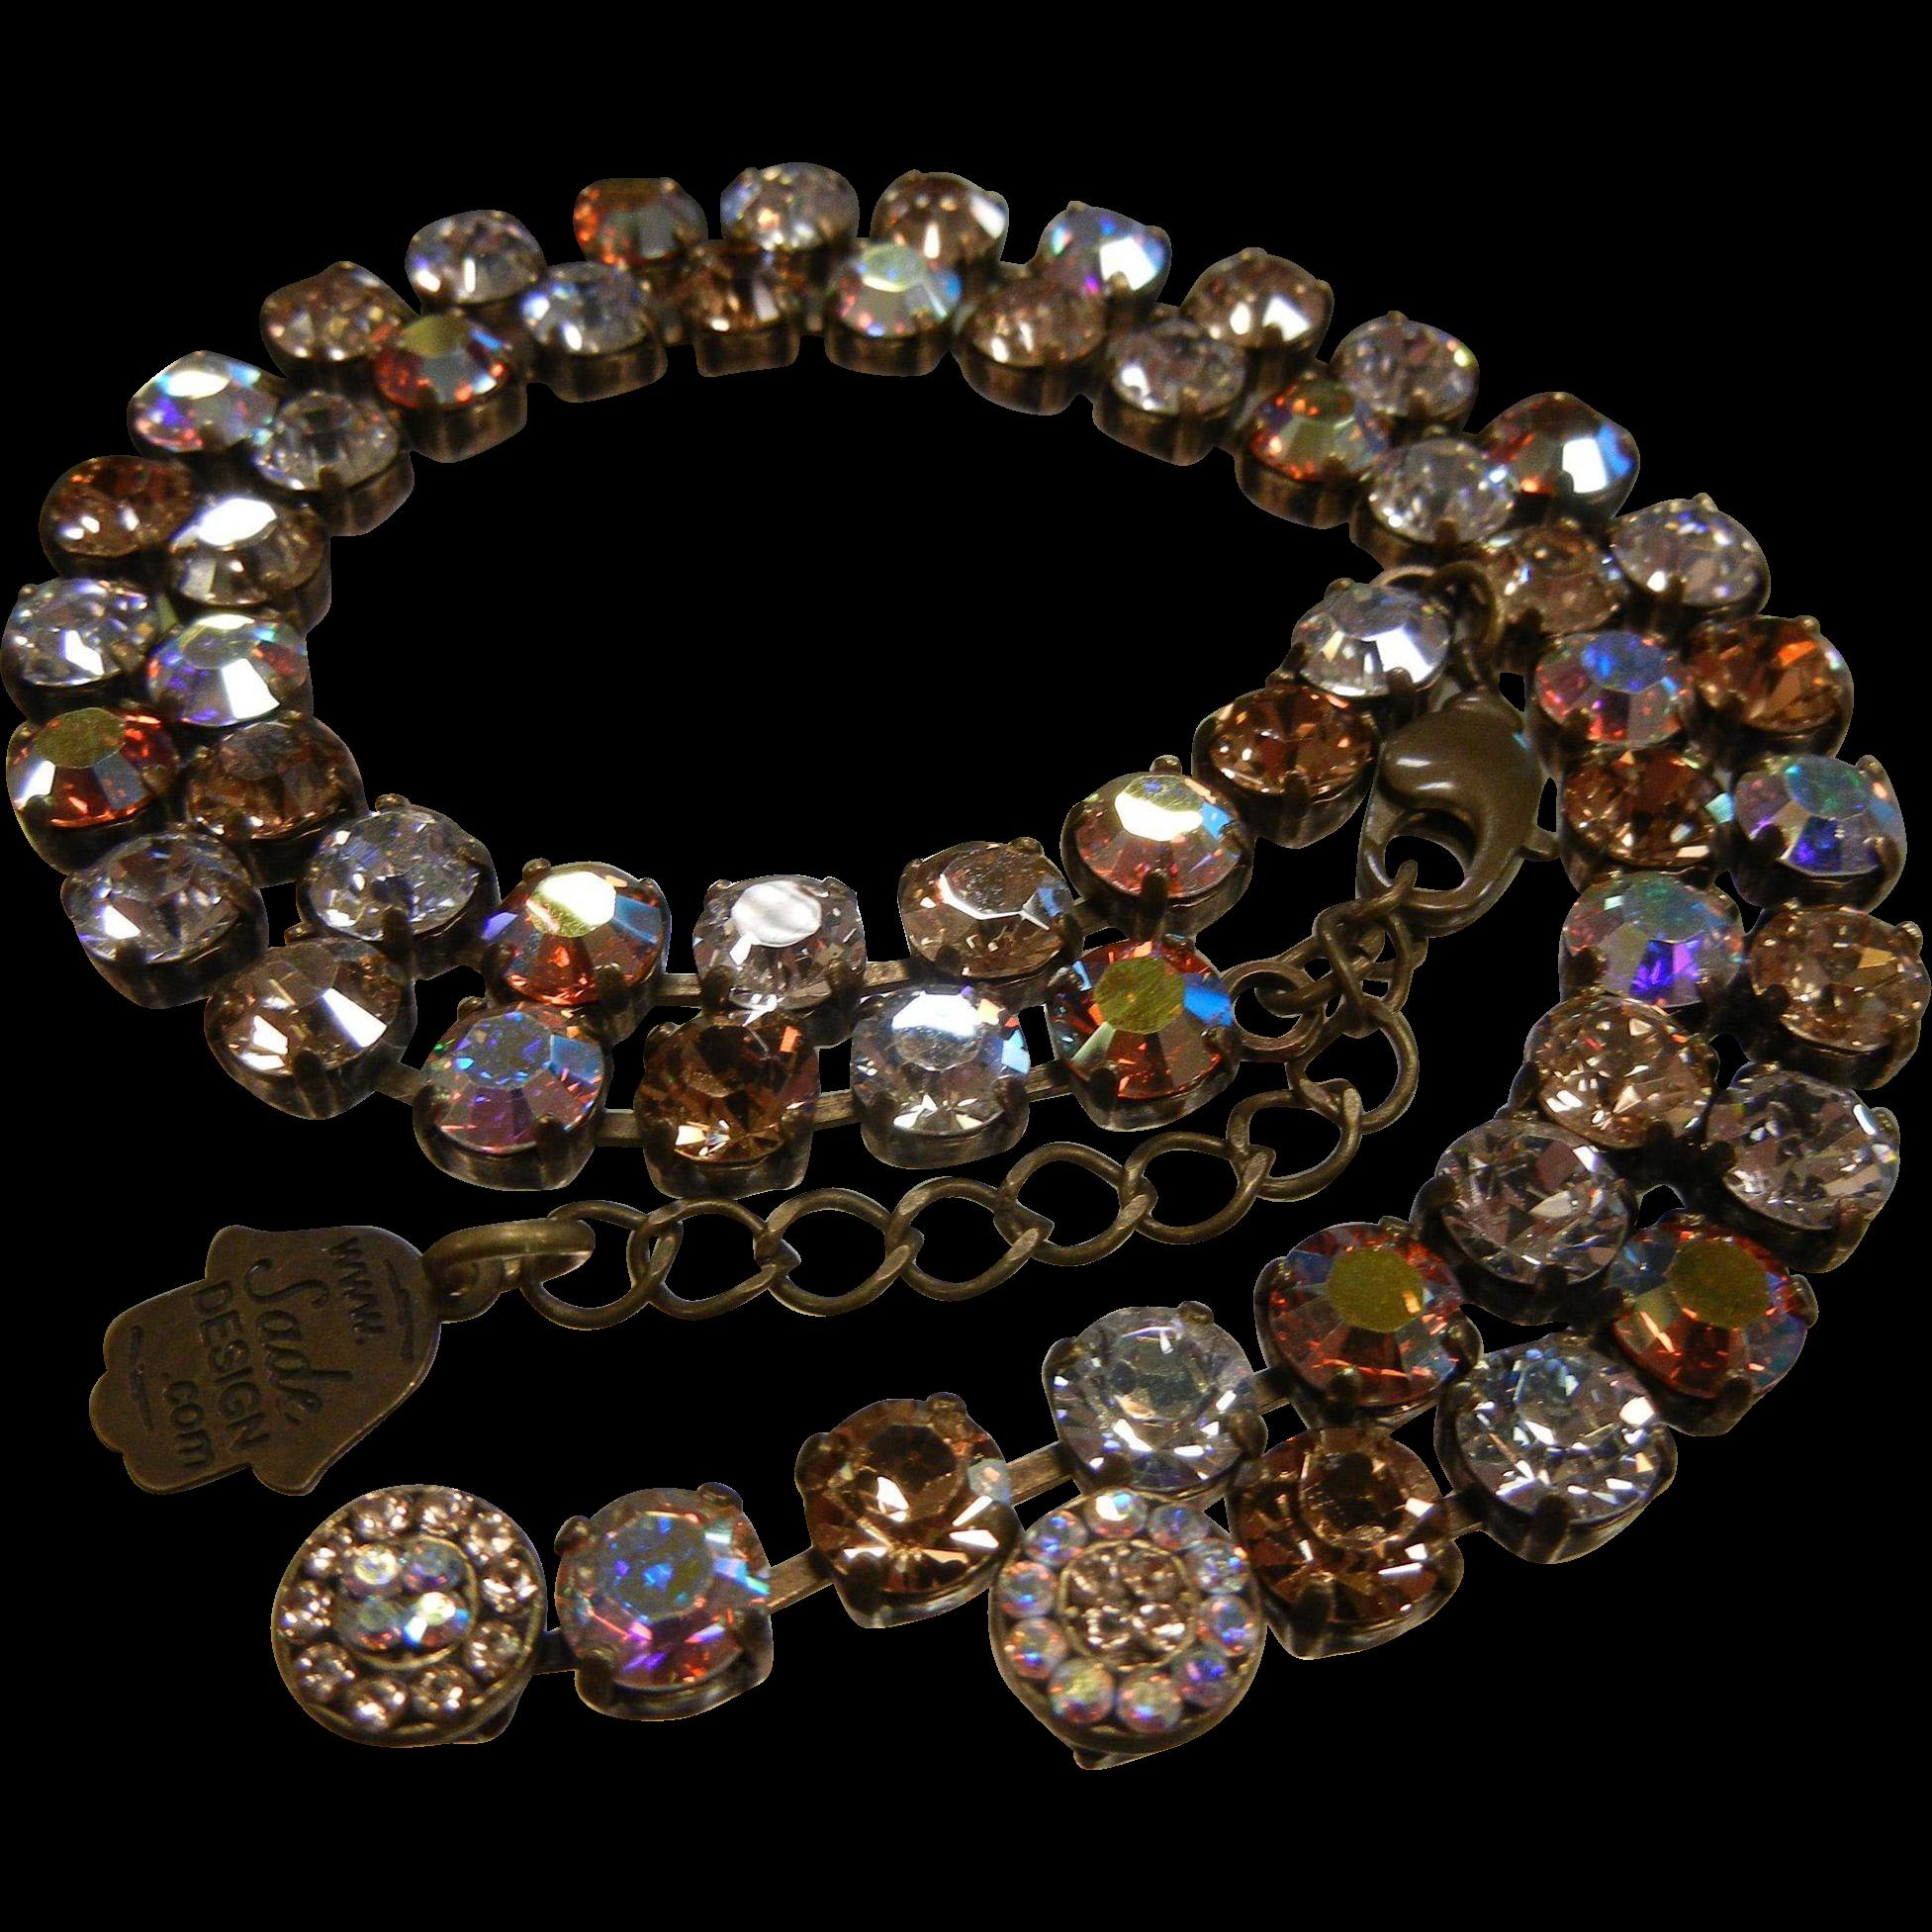 Autumn Color Aurora Borealis Crystal Necklace